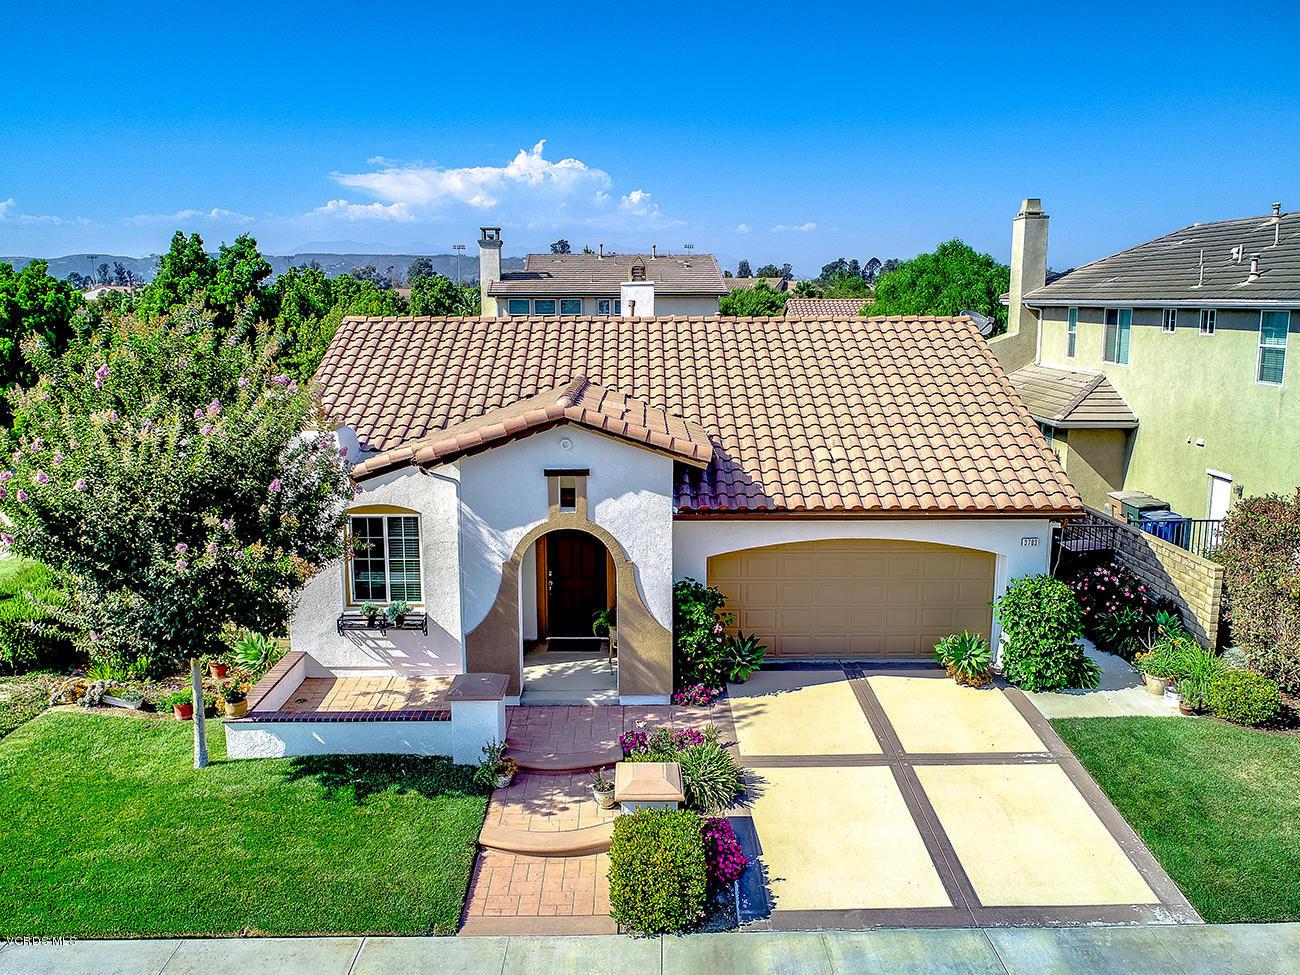 3703 Fountain Street, Camarillo, CA 93012